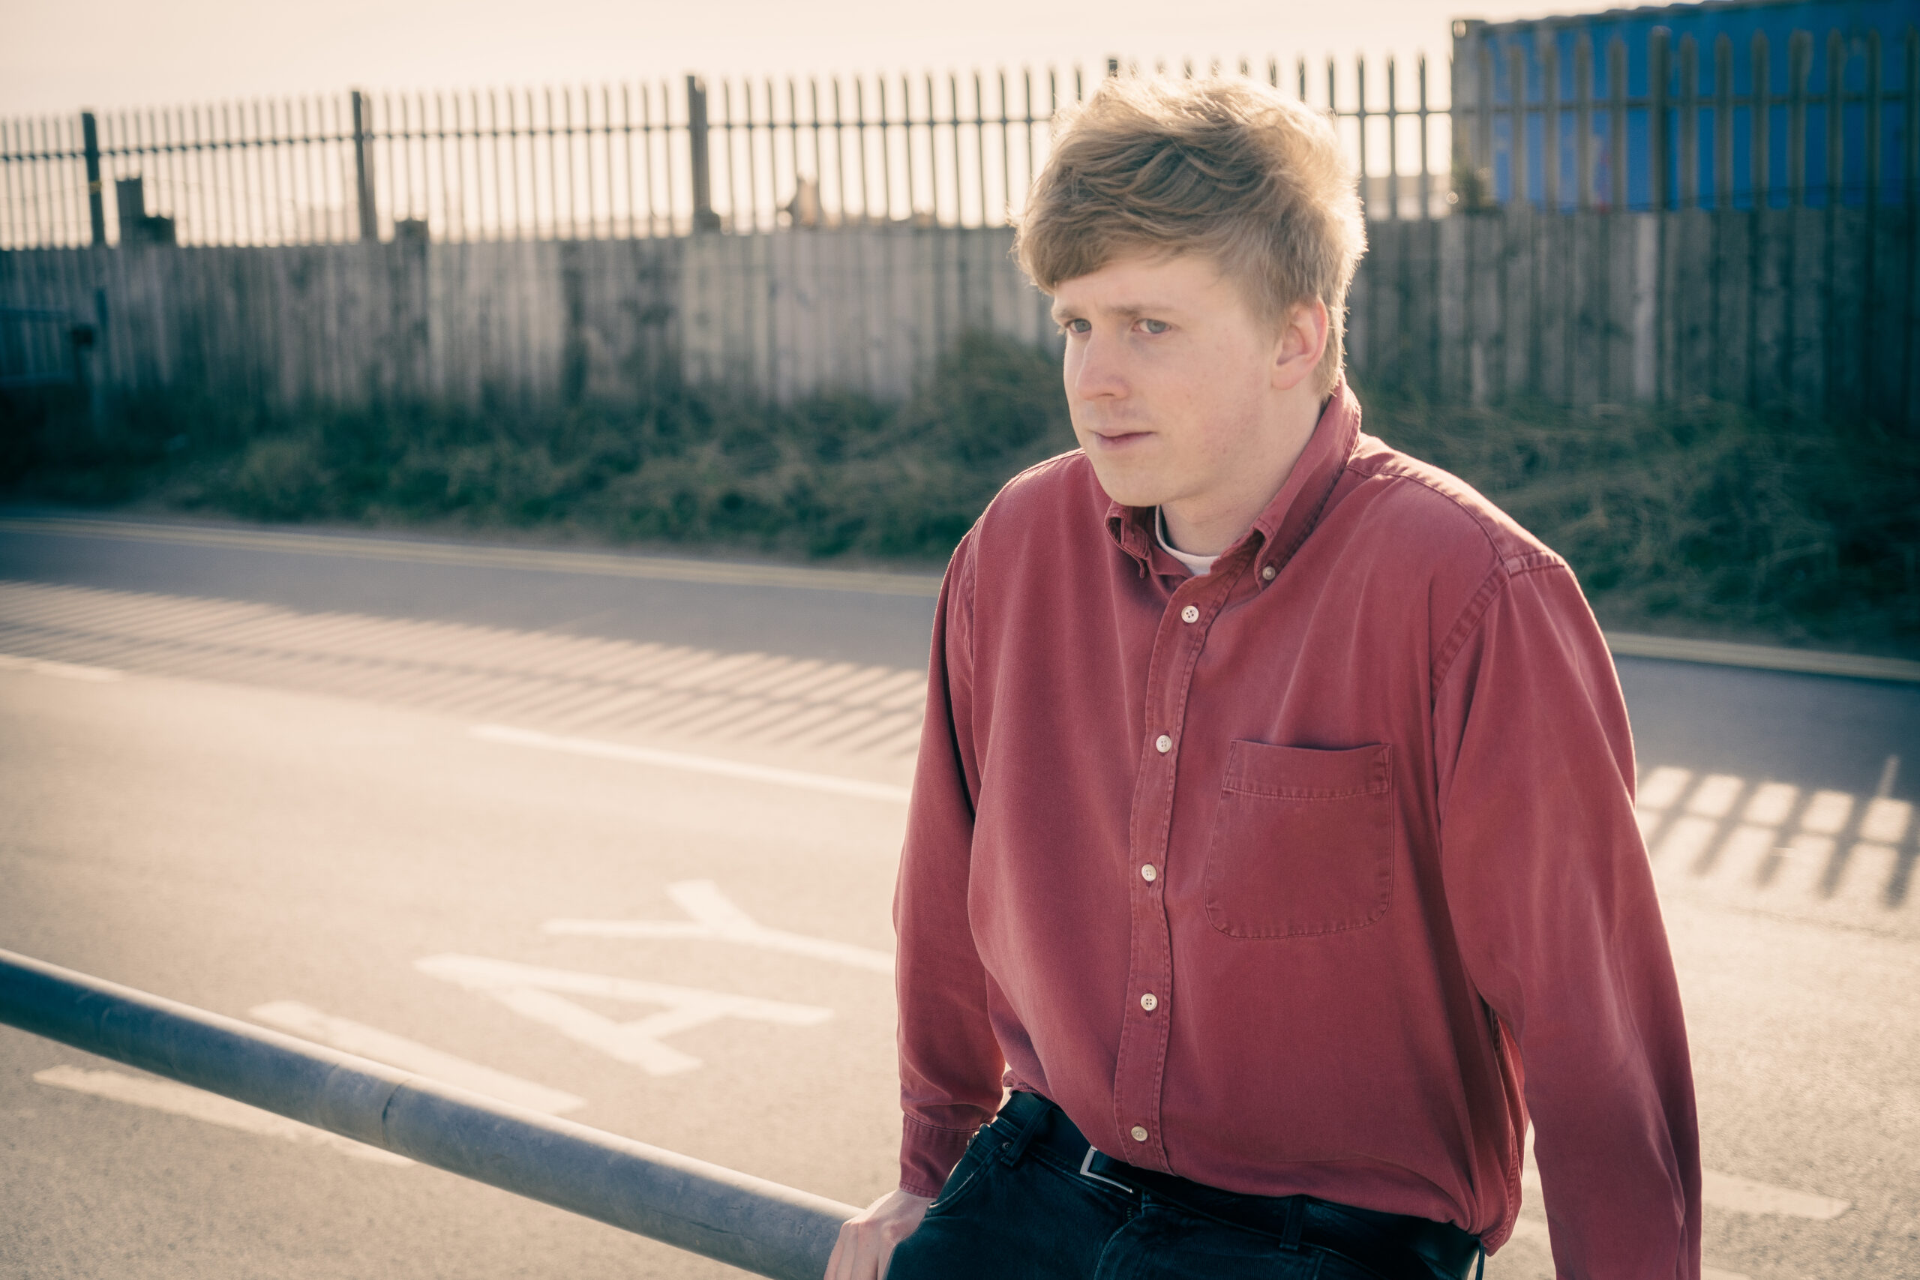 NEWS: James Leonard Hewitson debuts new single 'Temporary Values'